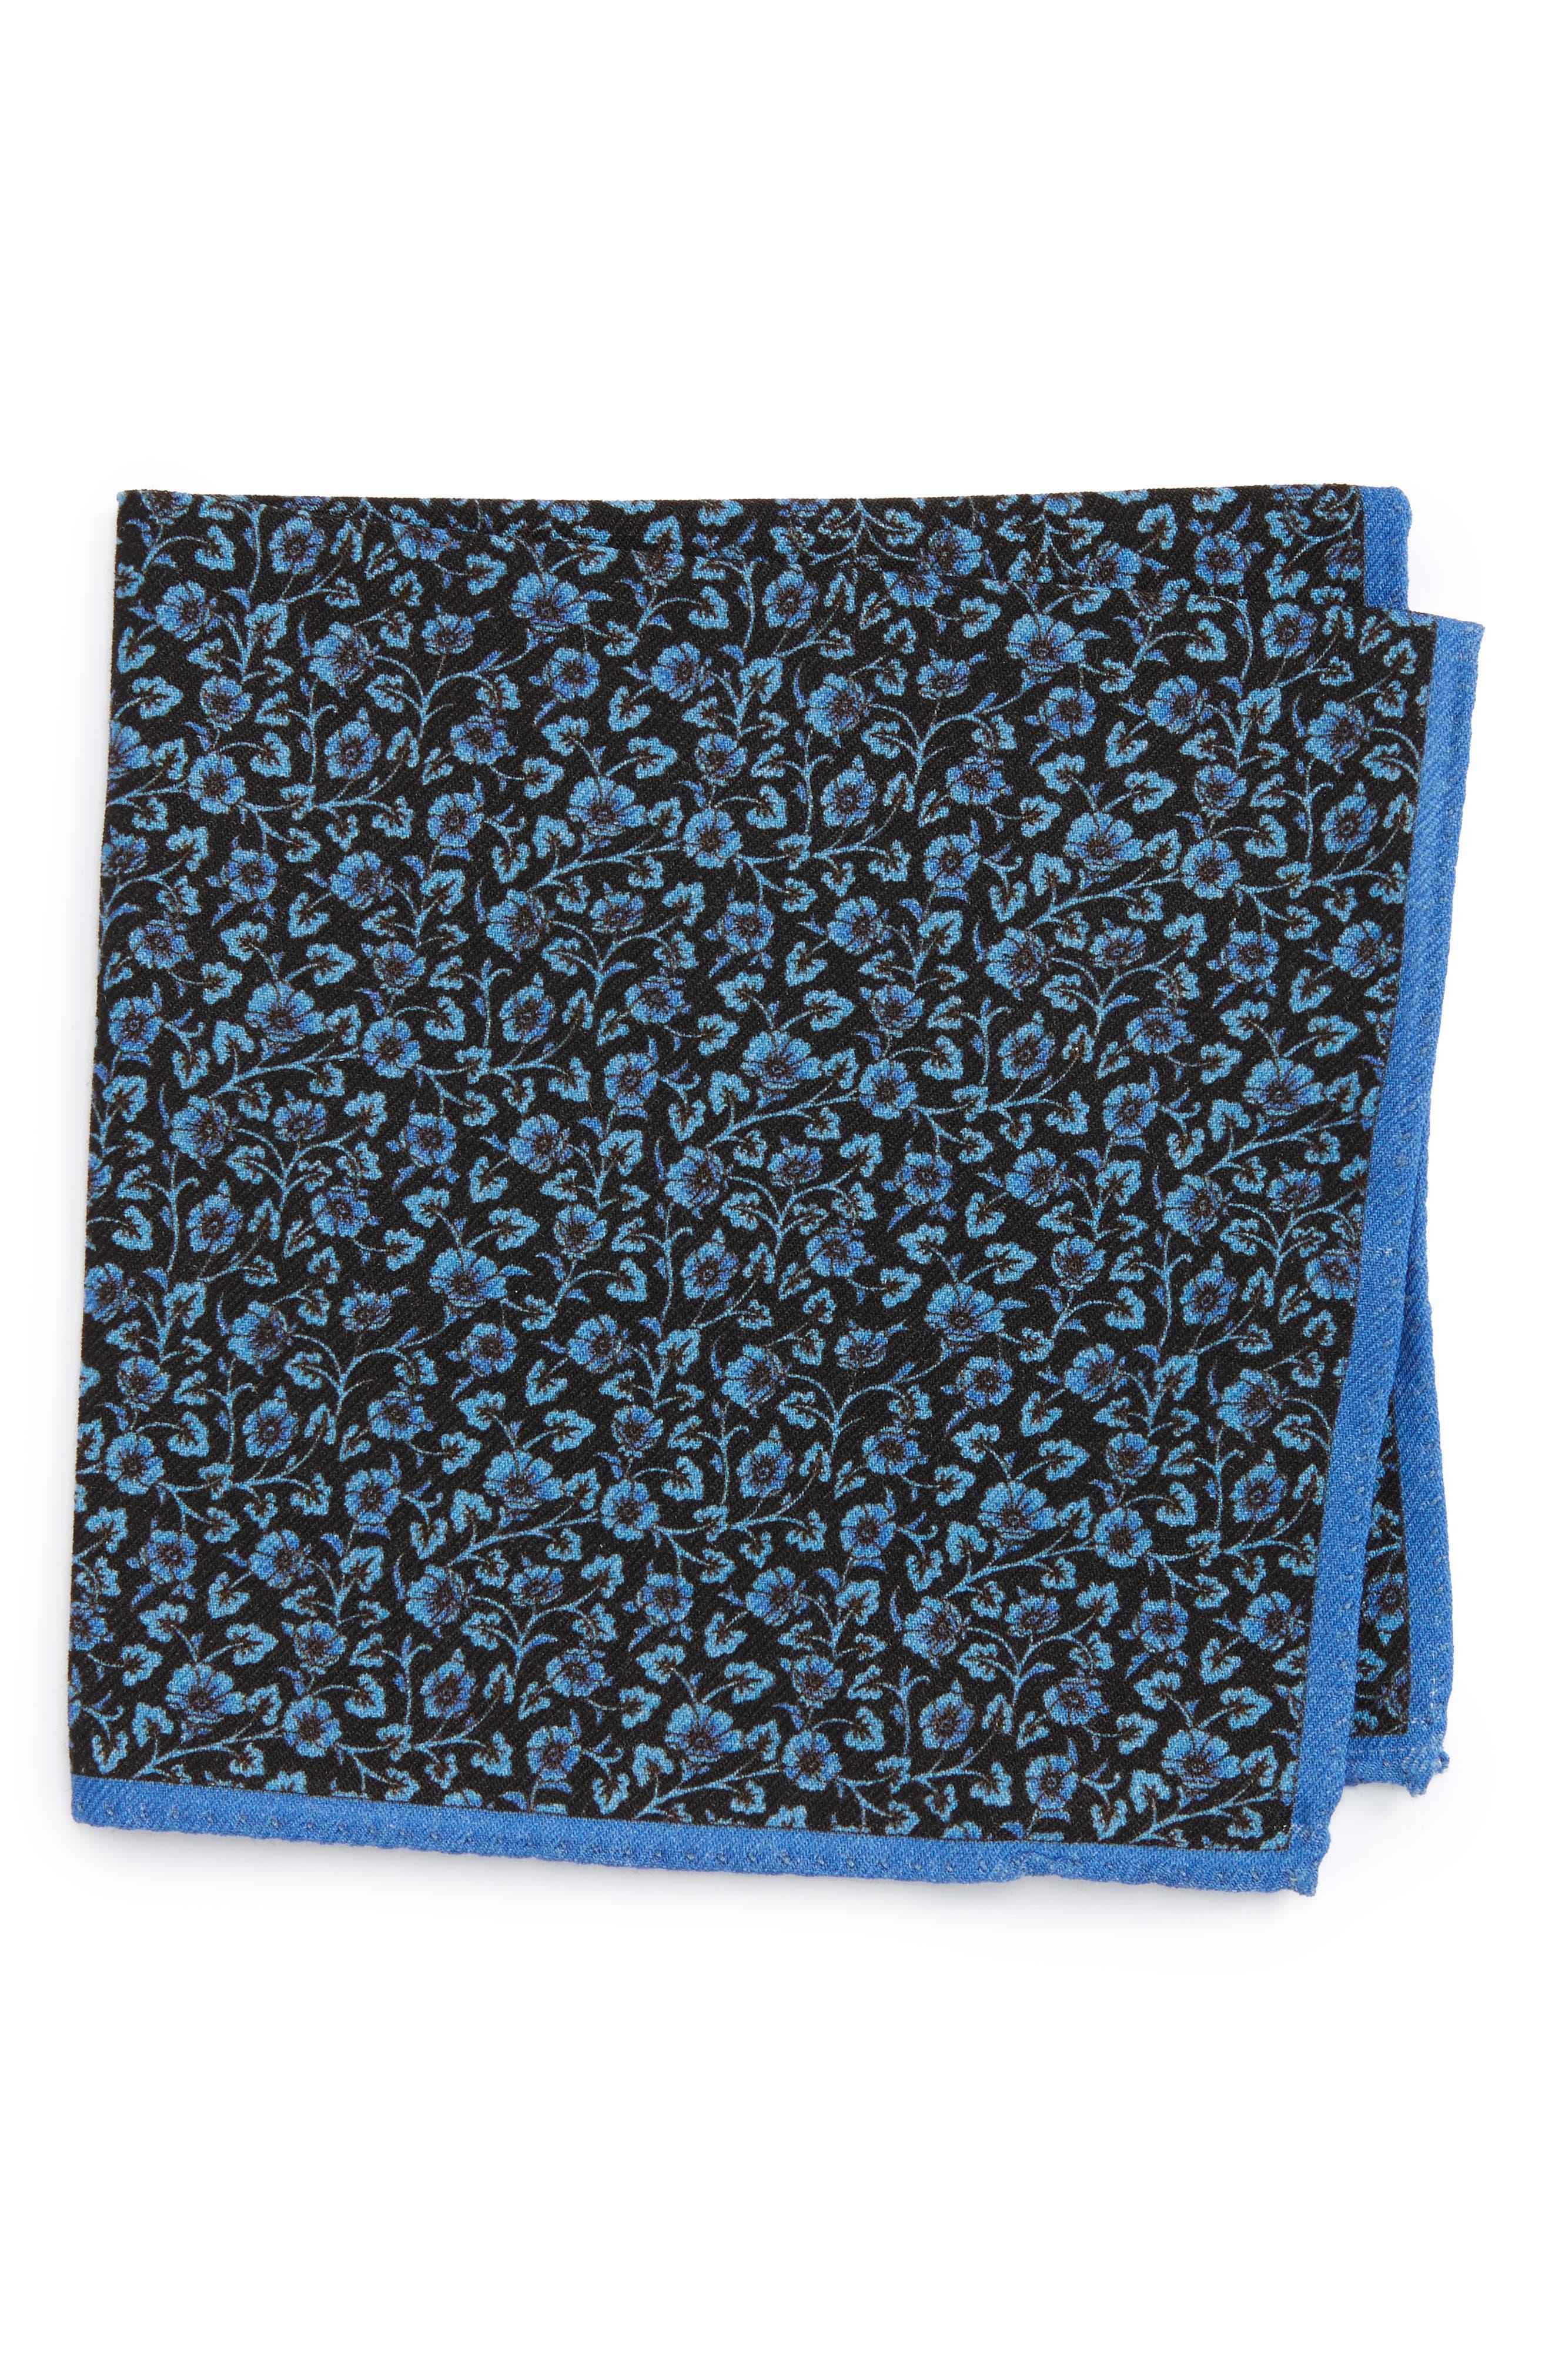 Ted Baker London Clover Print Wool Pocket Square